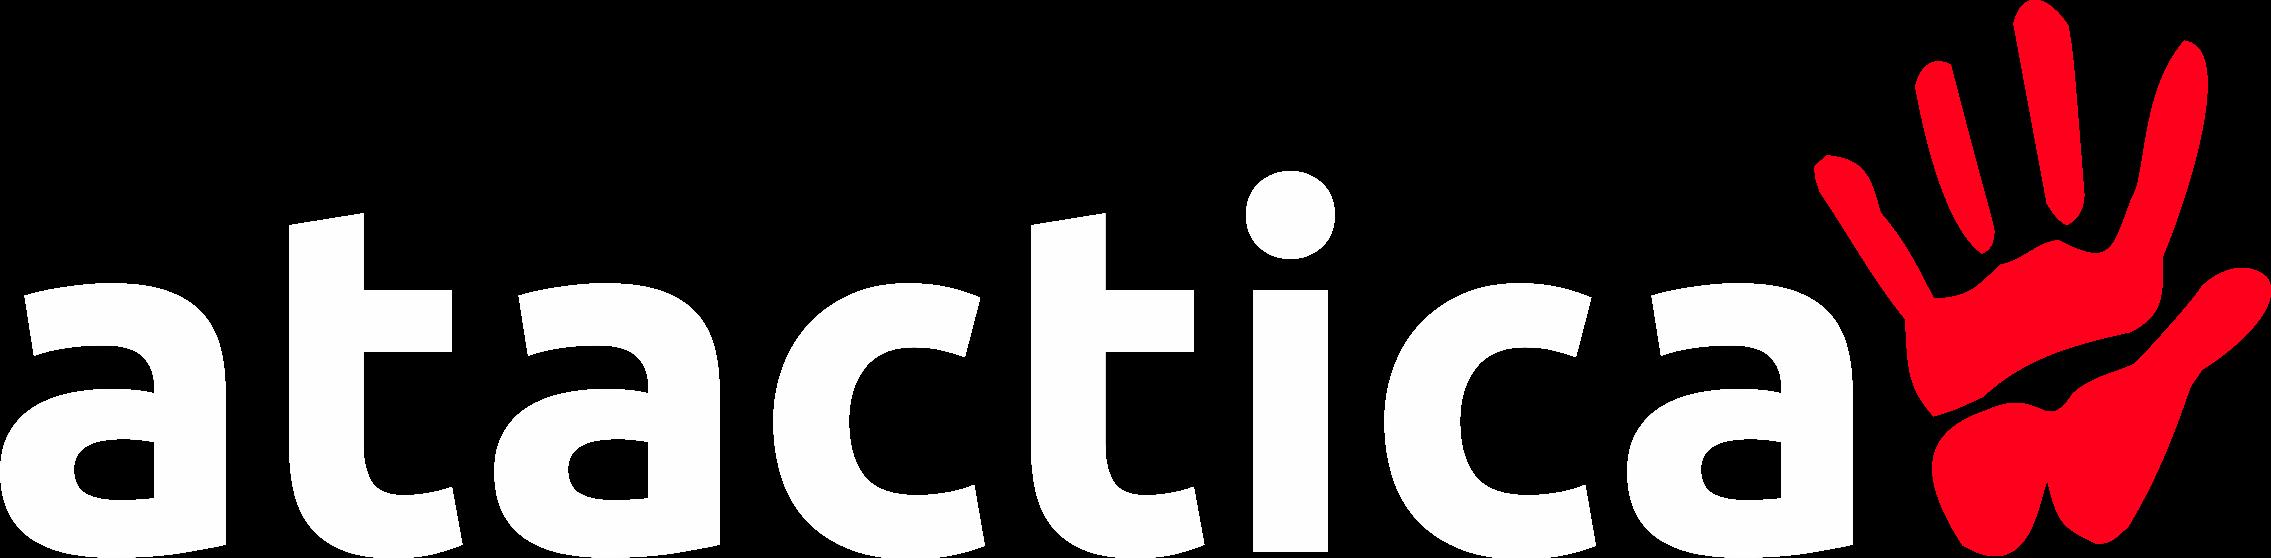 Atactica